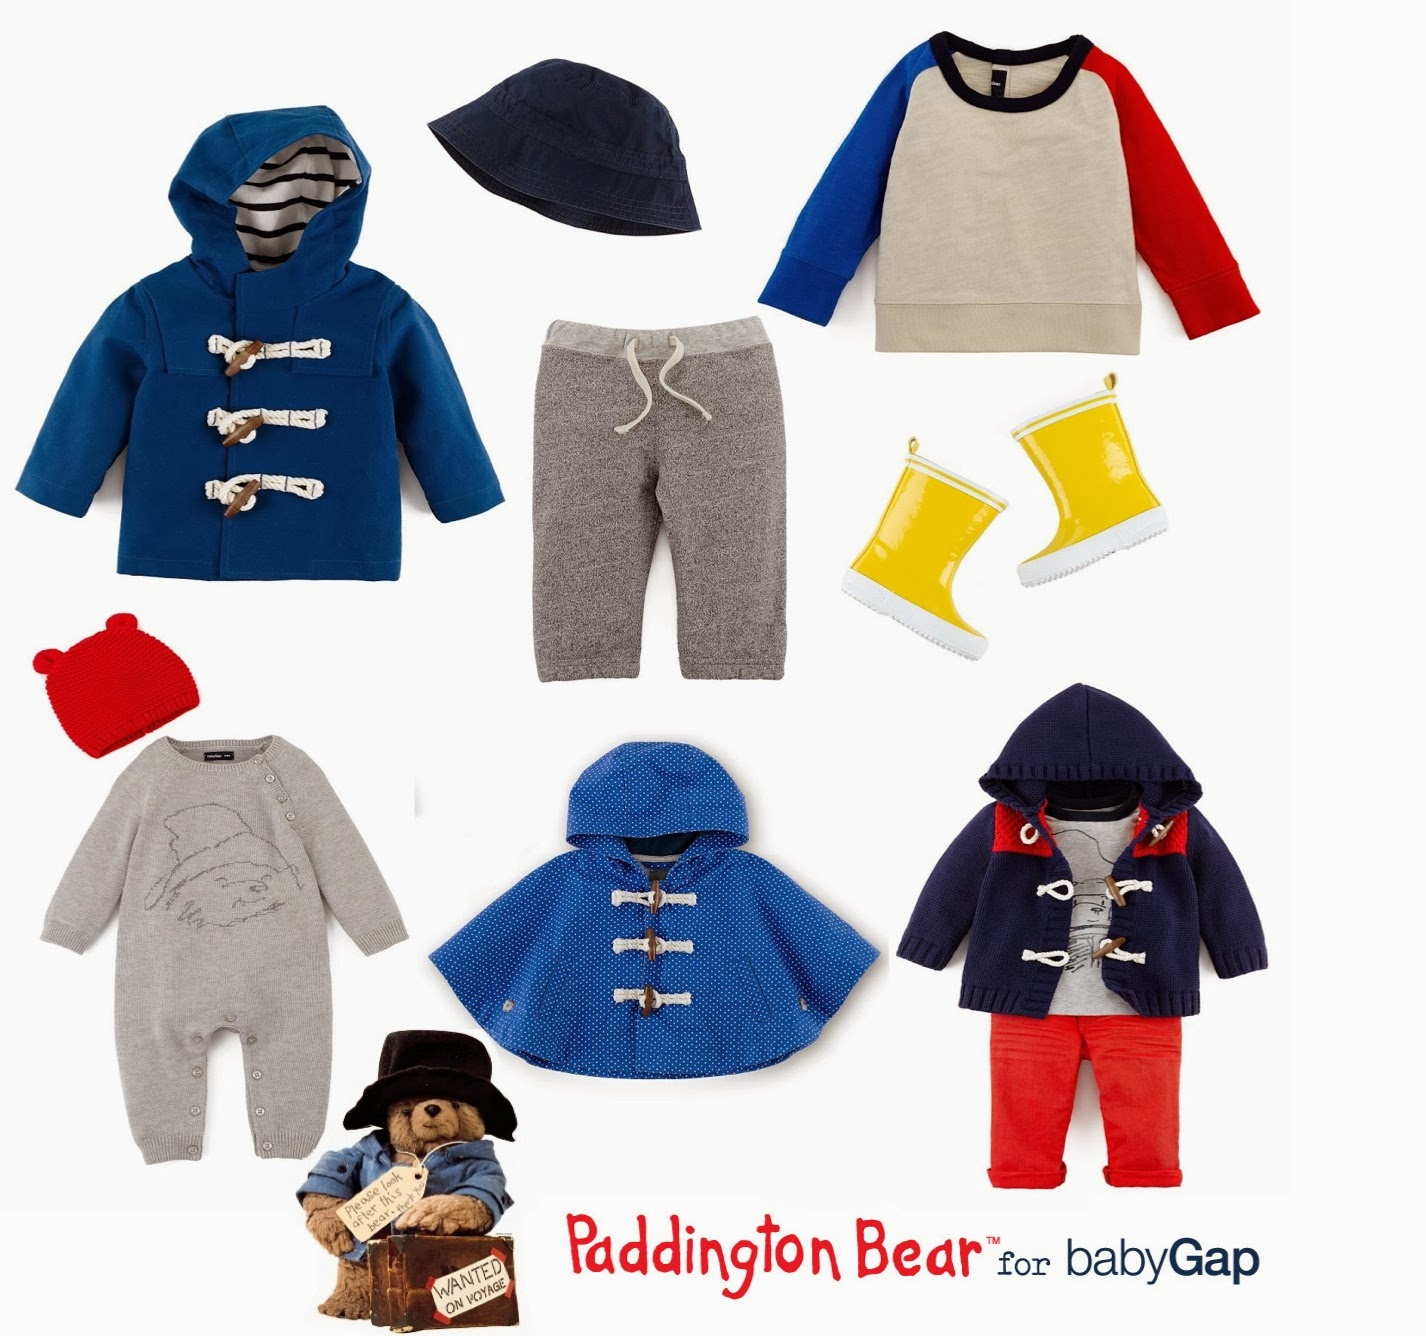 mamasVIB | V. I. BABY: The Paddington Bear collection finally arrives at Gap!, V. I. BABY | Paddington Bear comes to Gap | limited collection | baby gap | paddington bear | classic children's stories | new collection launching | mamasVIB